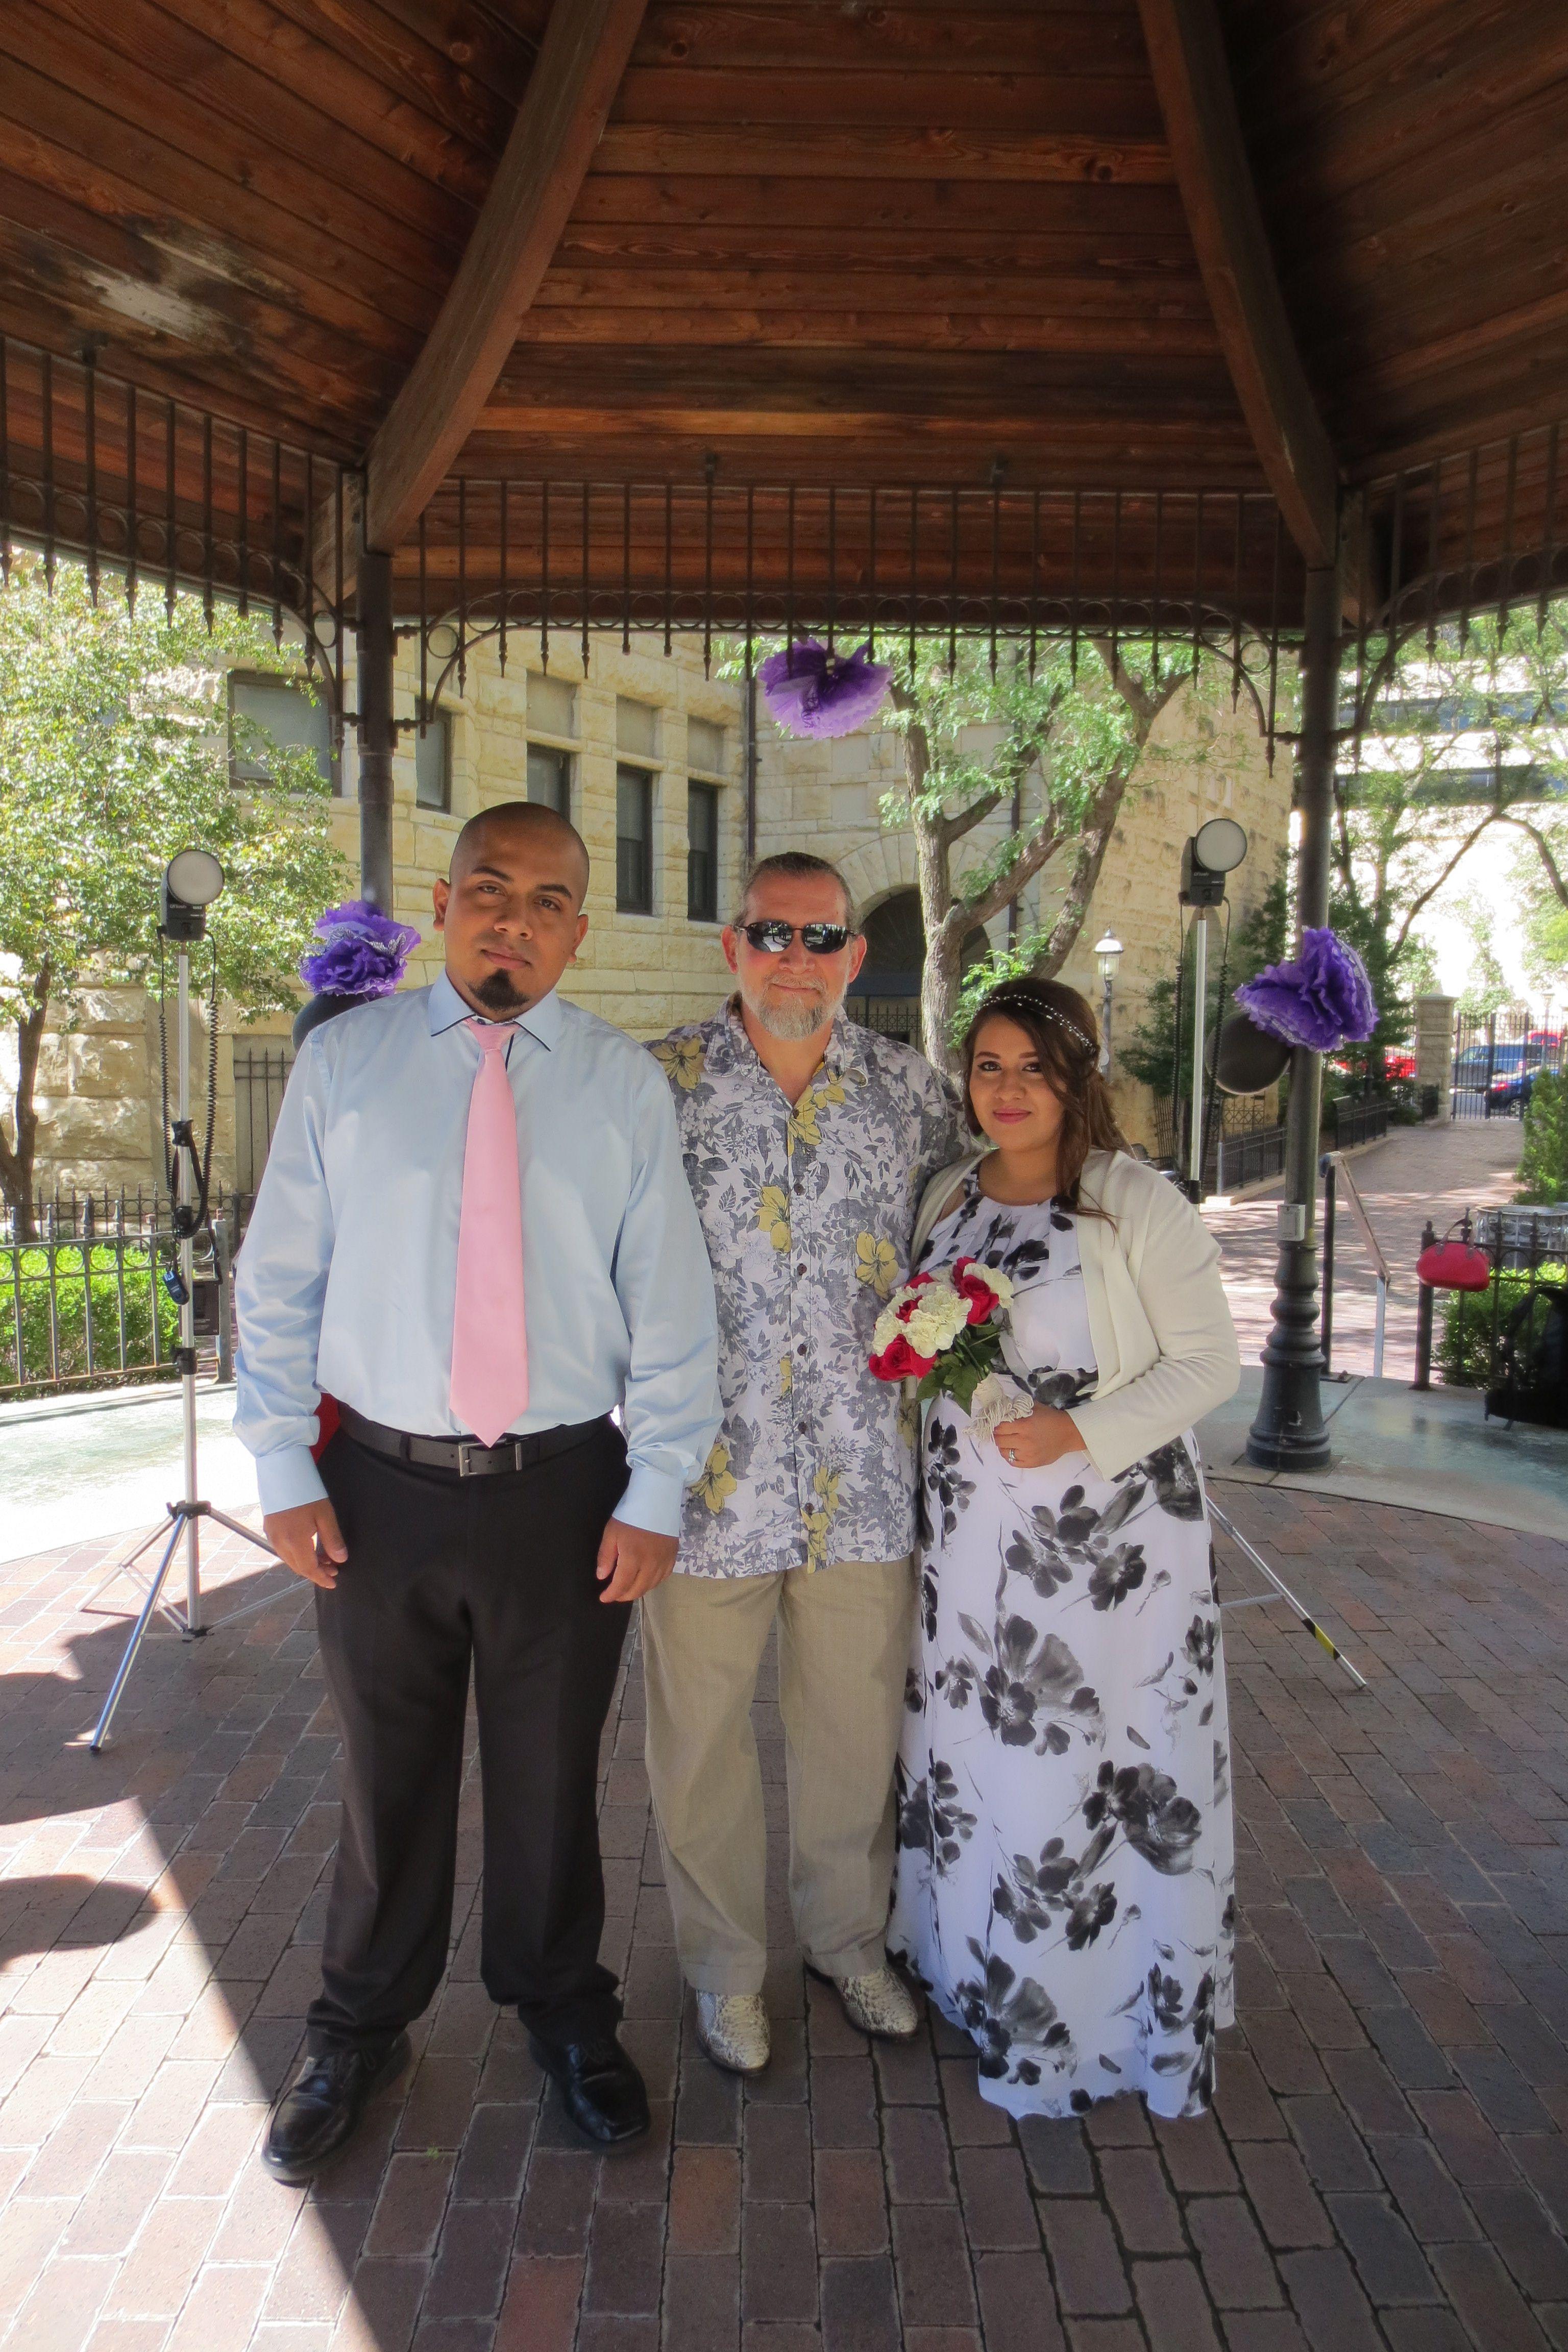 Dudeist priest wedding